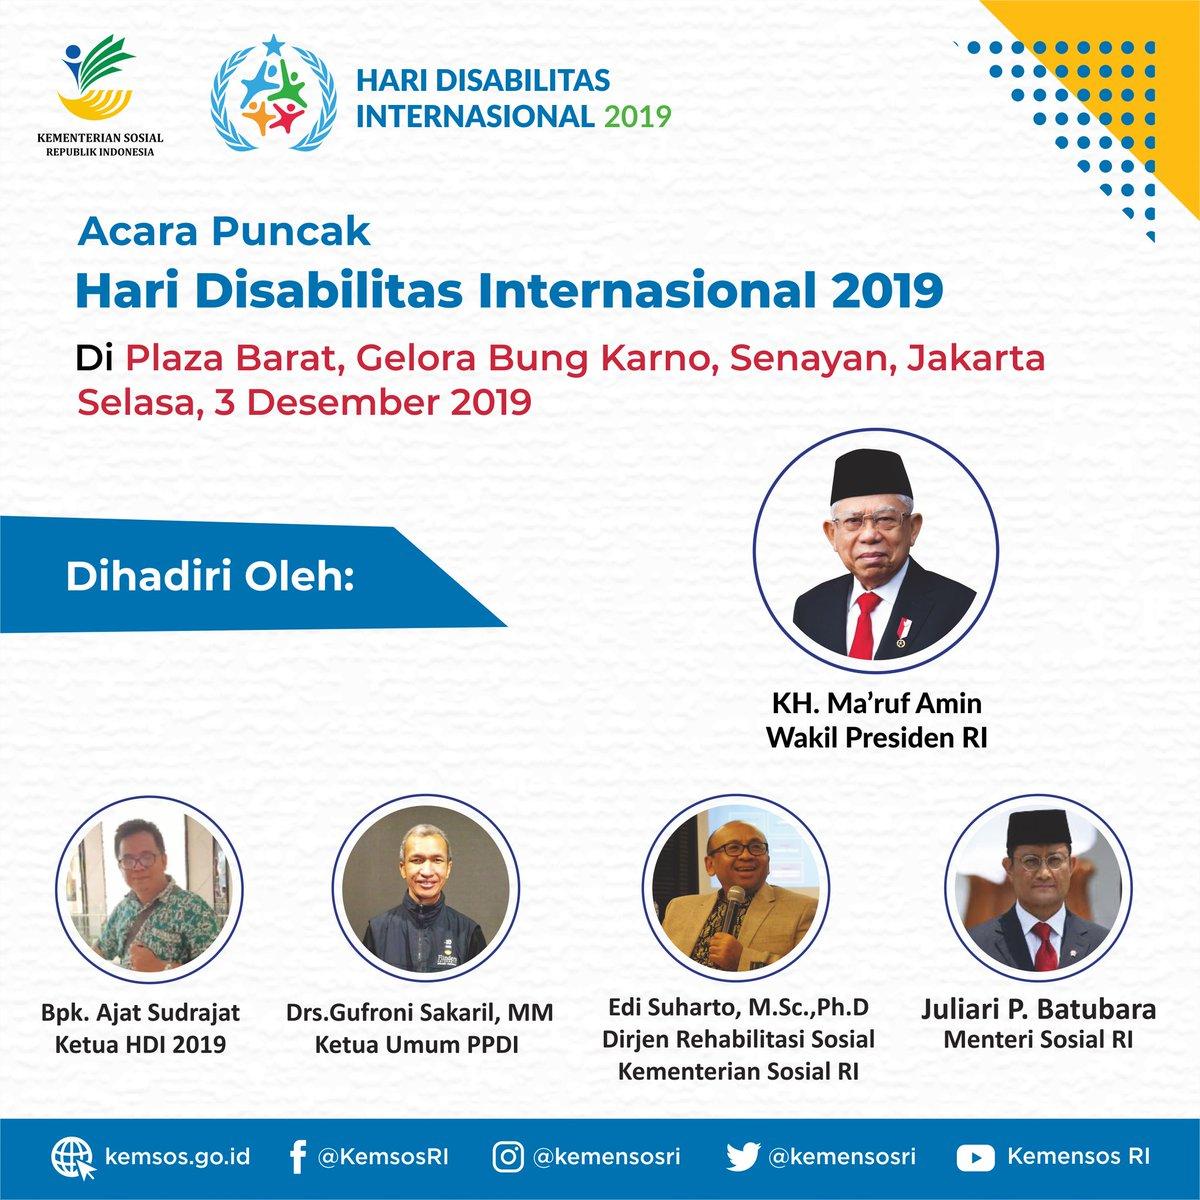 "Hari ini digelar acara Acara Puncak HDI 2019 di Senayan Jakarta. #Kemensos mengajak publik merayakan HDI bersama para penyandang disabilitas dan perkuat penghormatan serta perlindungan hak-hak penyandang disabilitas menuju ""Indonesia Inklusi, Disabilitas Unggul"" 🇮🇩#IndonesiaMaju"